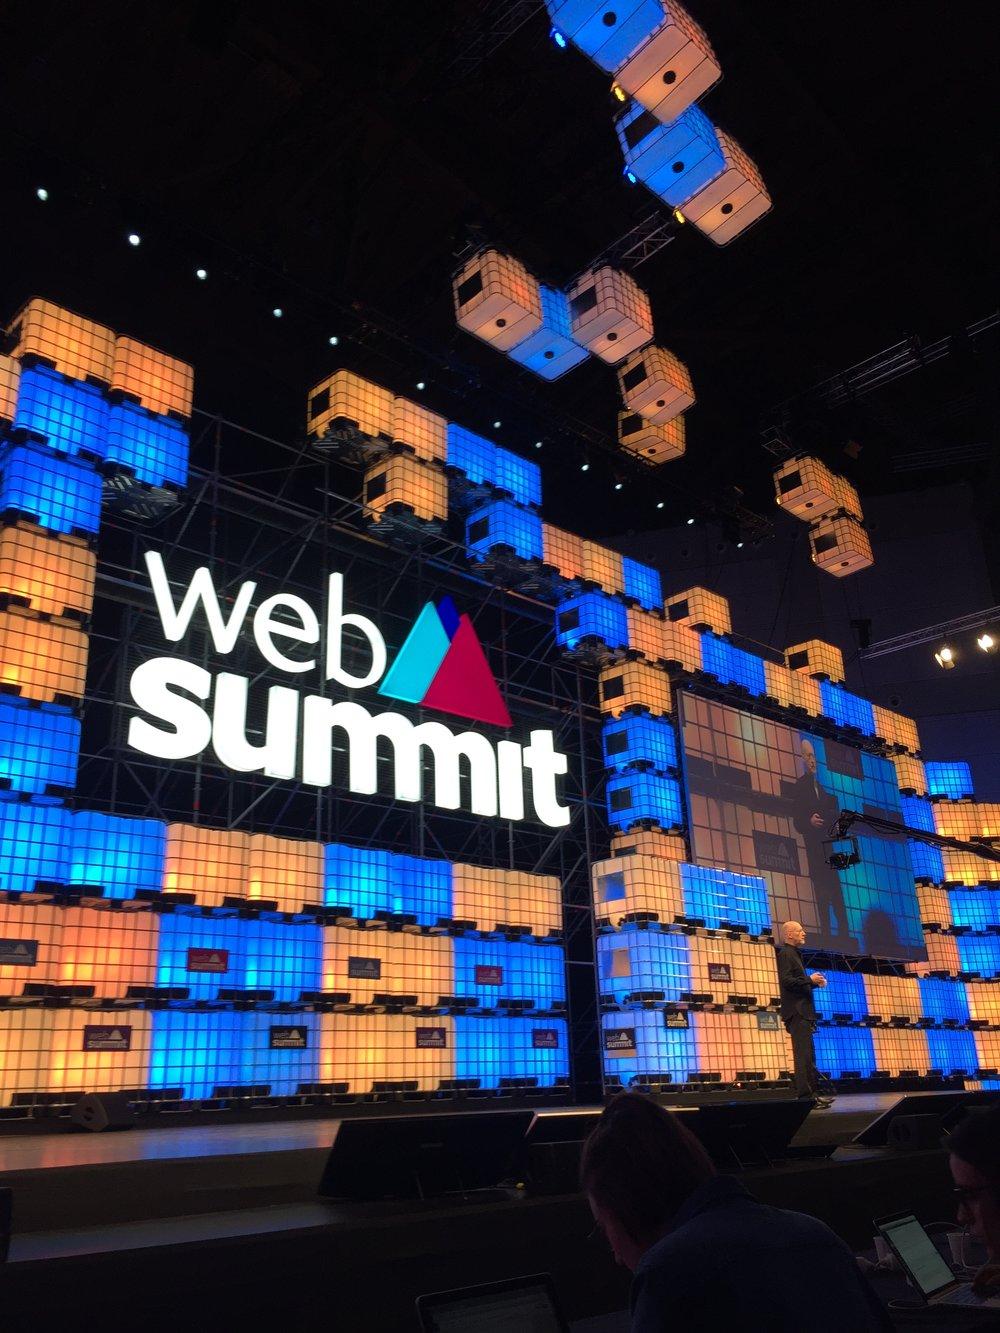 Web-summit-lisbon-20176.JPG